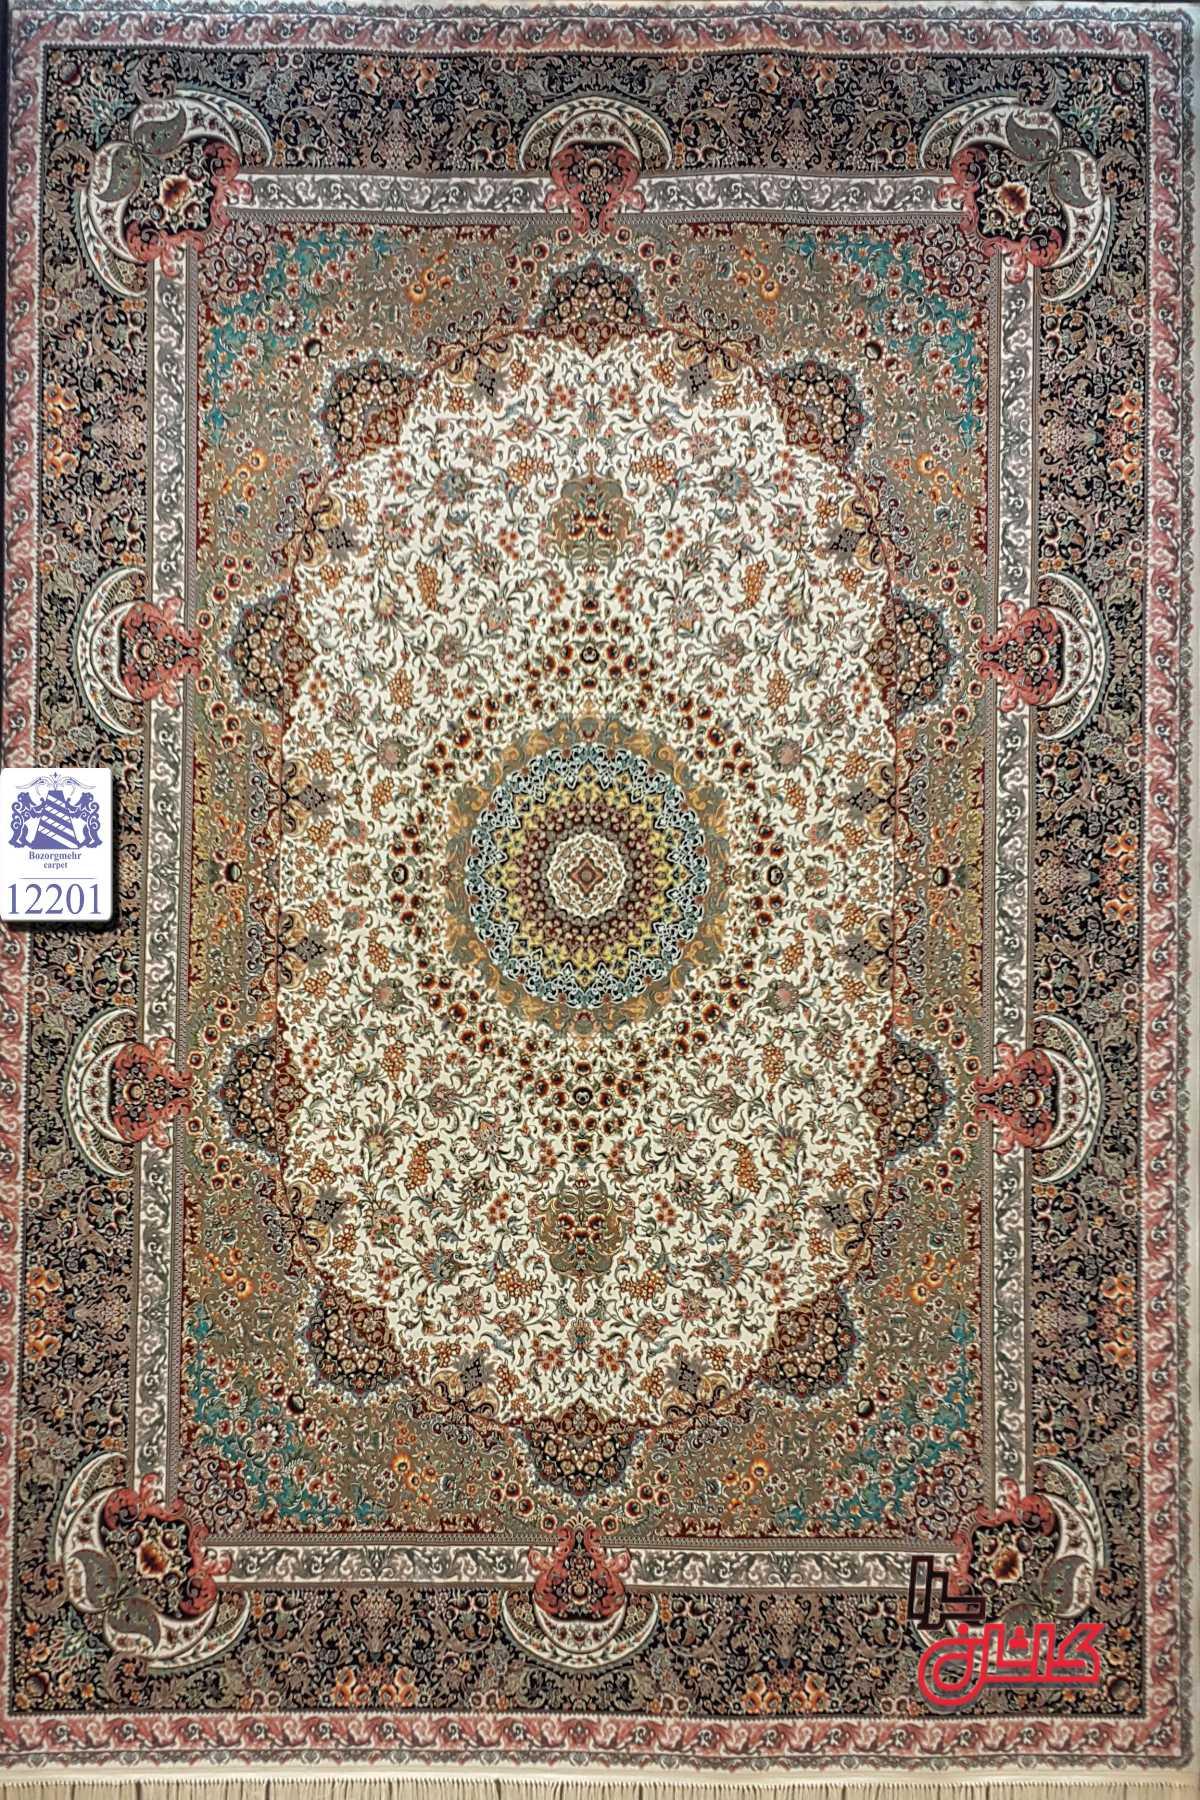 قیمت خرید فرش ماشینی ۱۲۰۰ شانه کاشان کد ۱۲۲۰۱